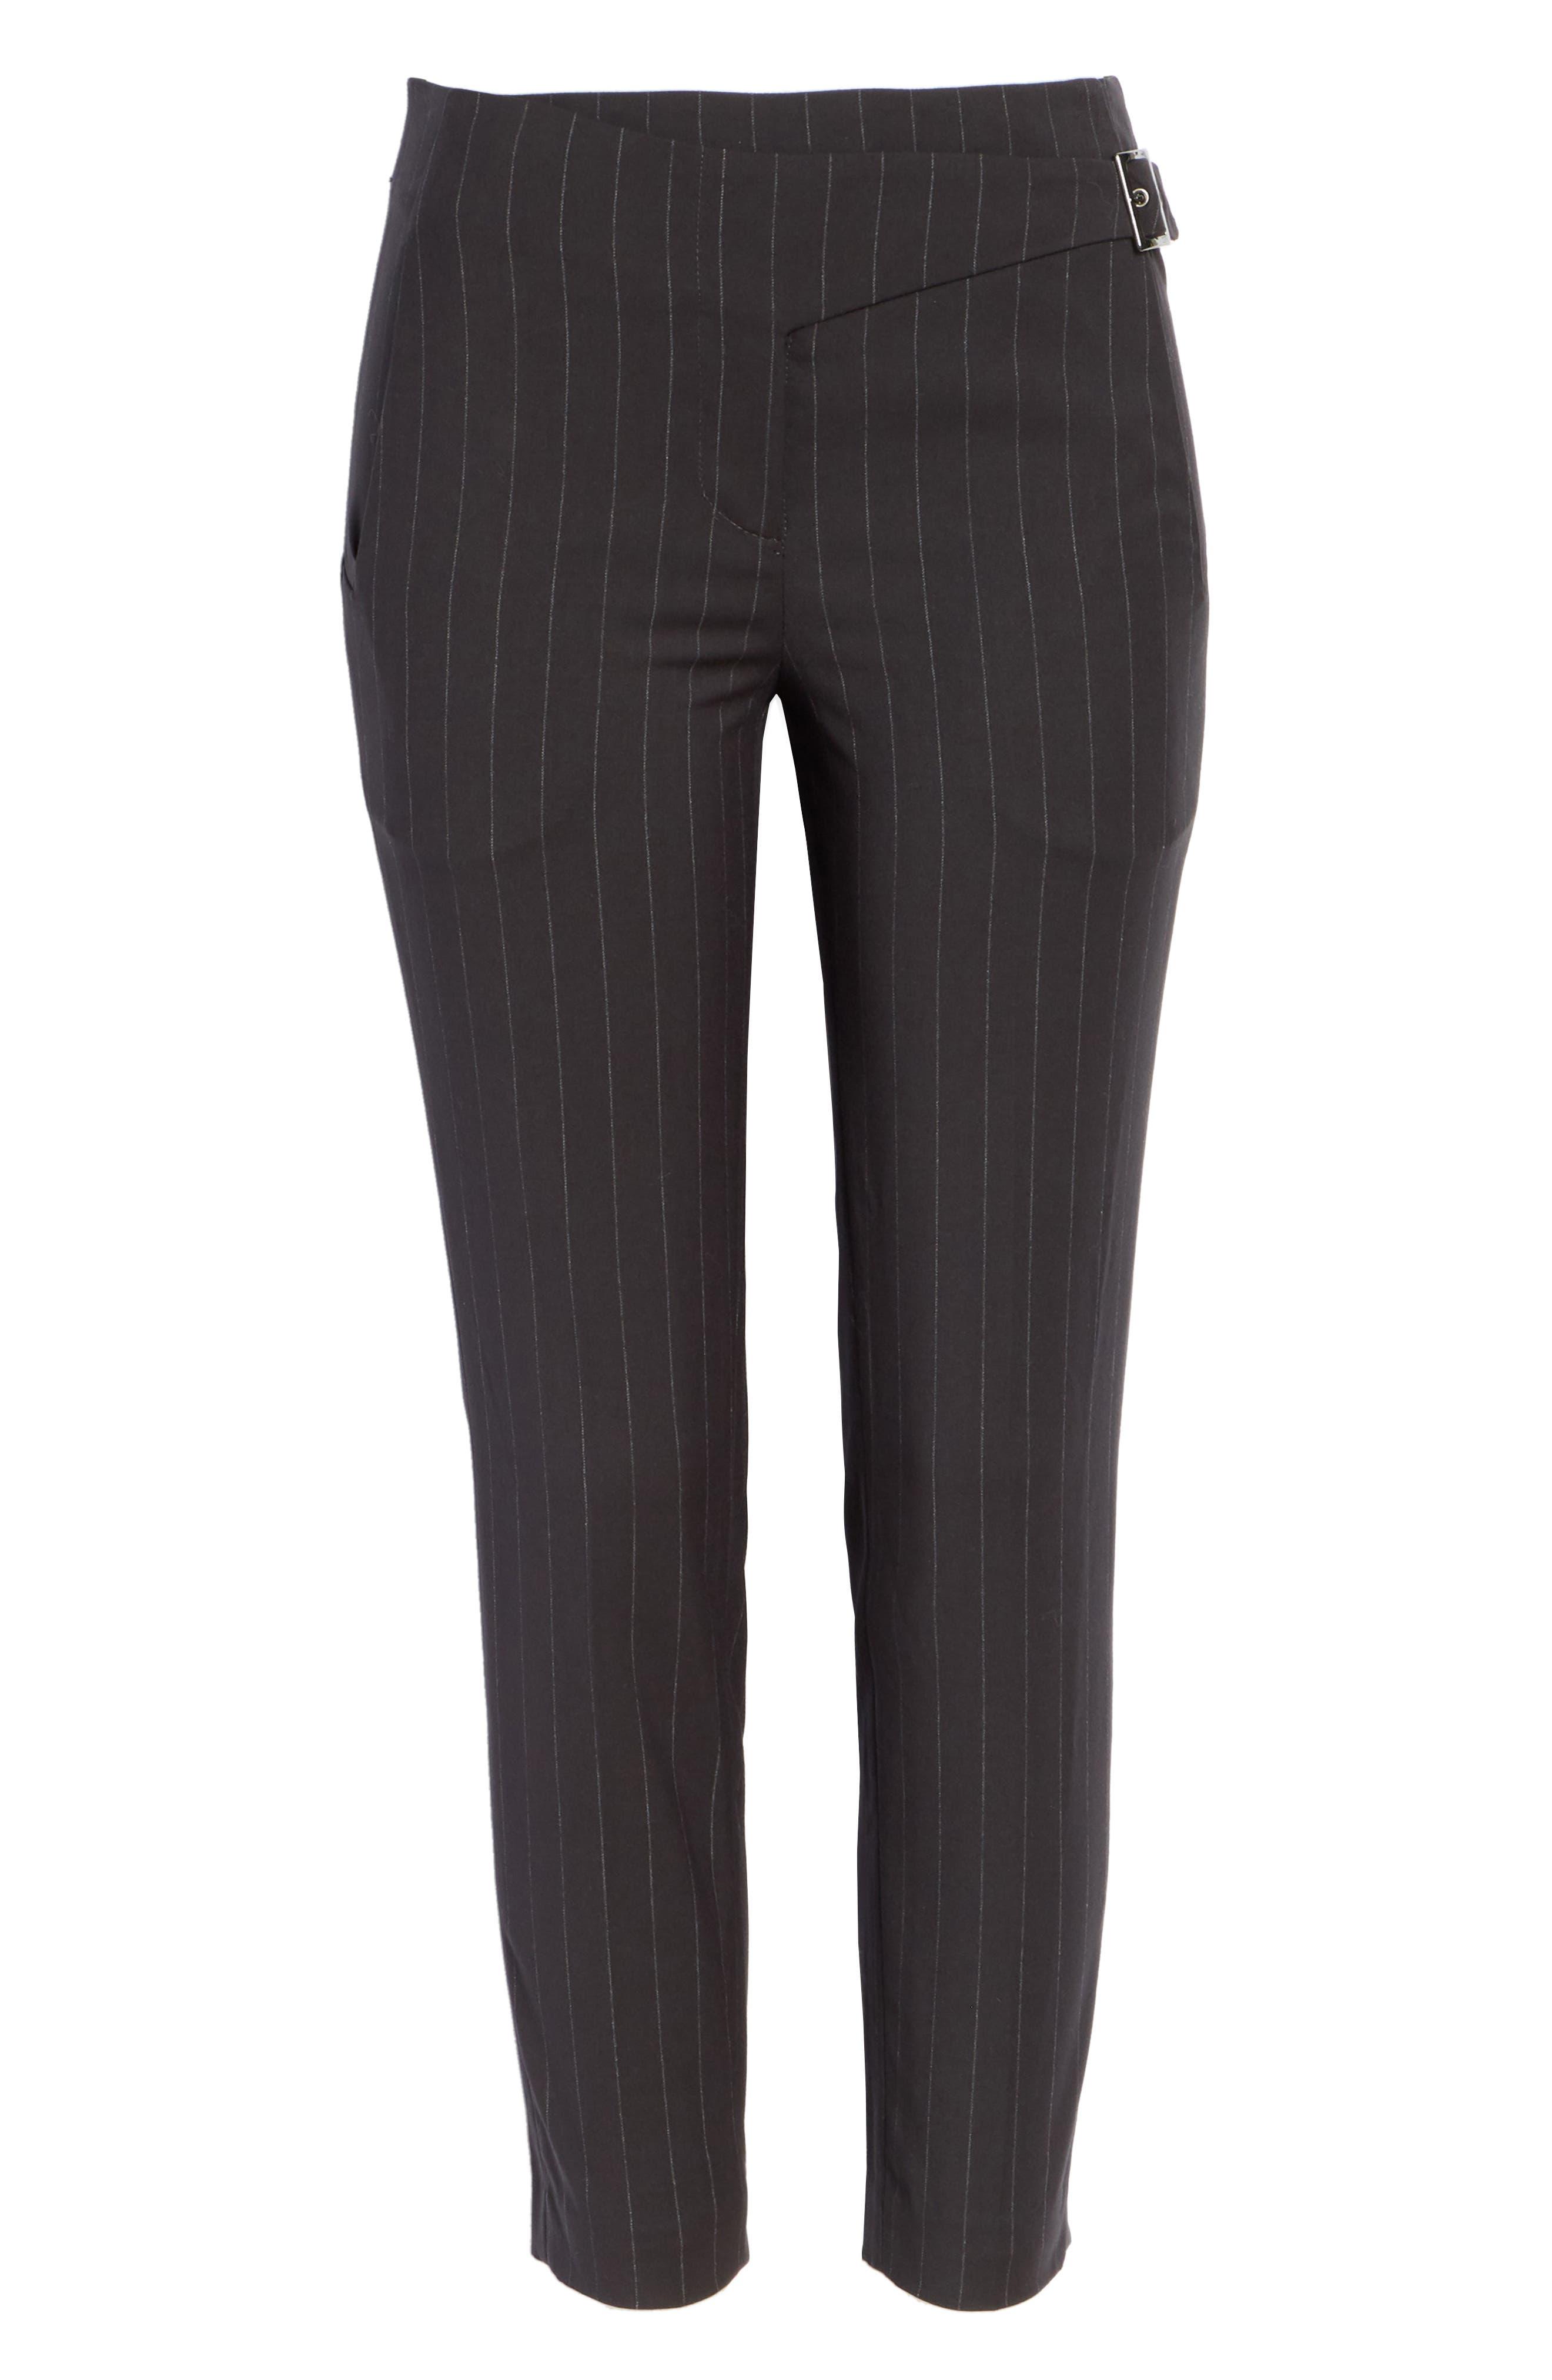 Bango Pinstripe Crop Trousers,                             Alternate thumbnail 6, color,                             001